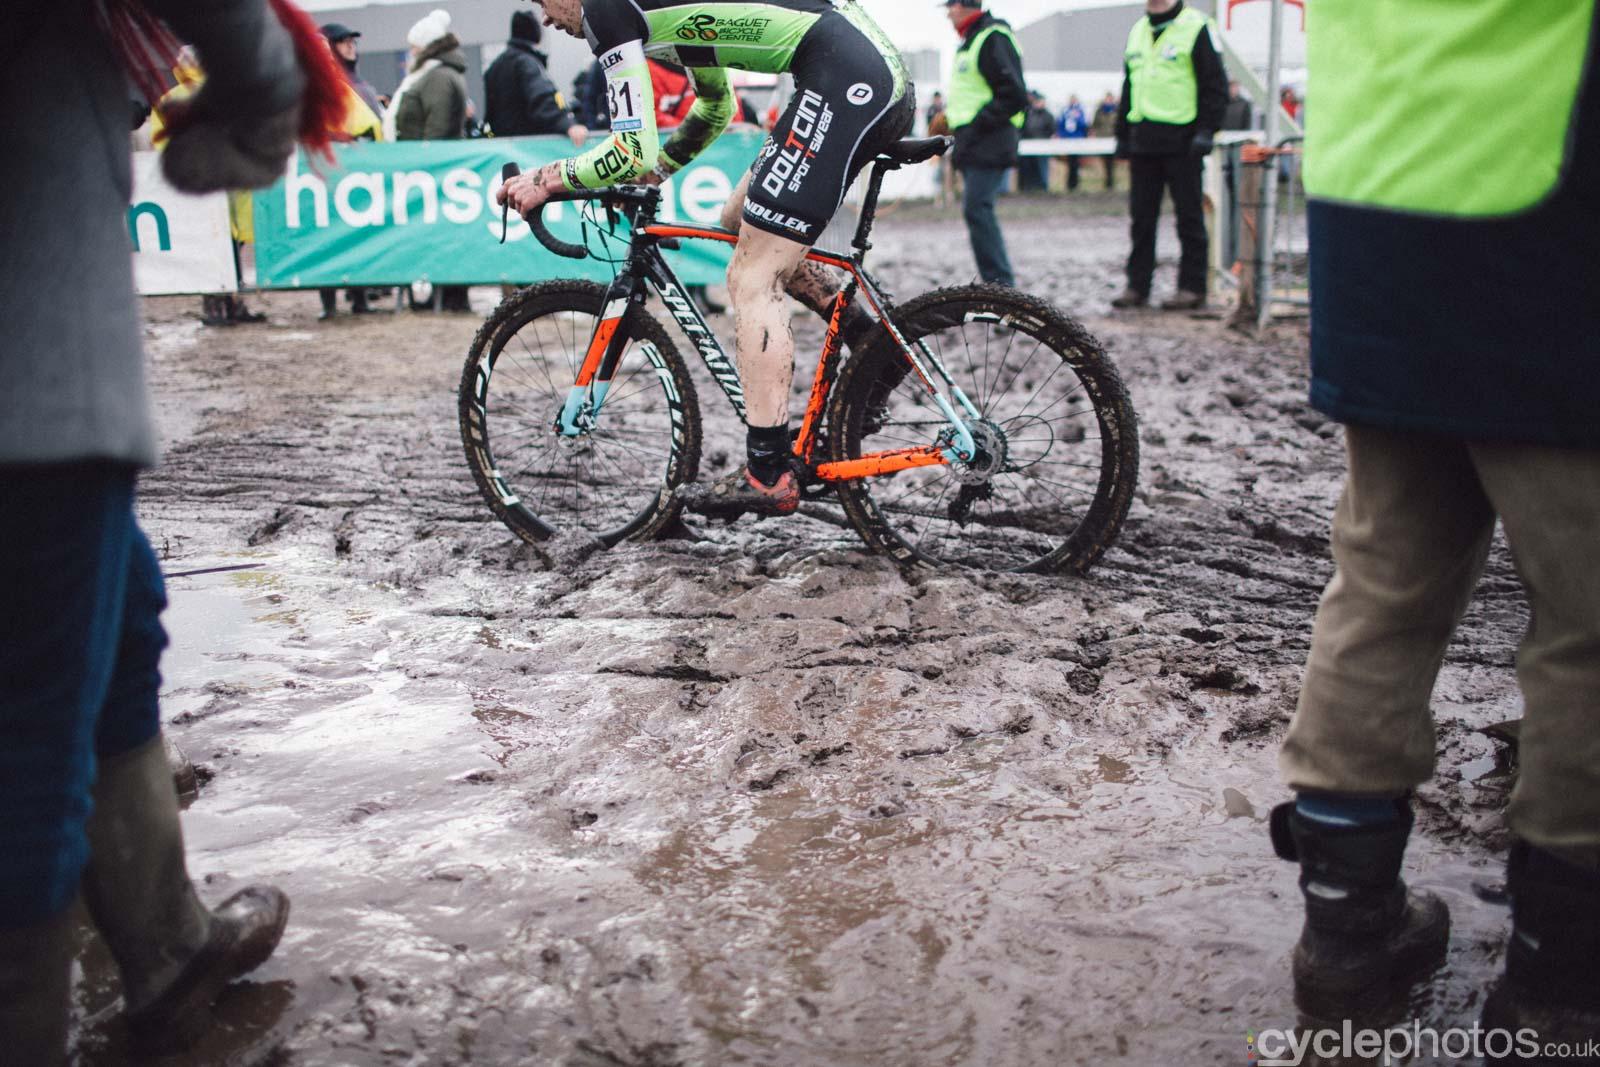 2016-cyclephotos-cyclocross-hoogstraten-125853